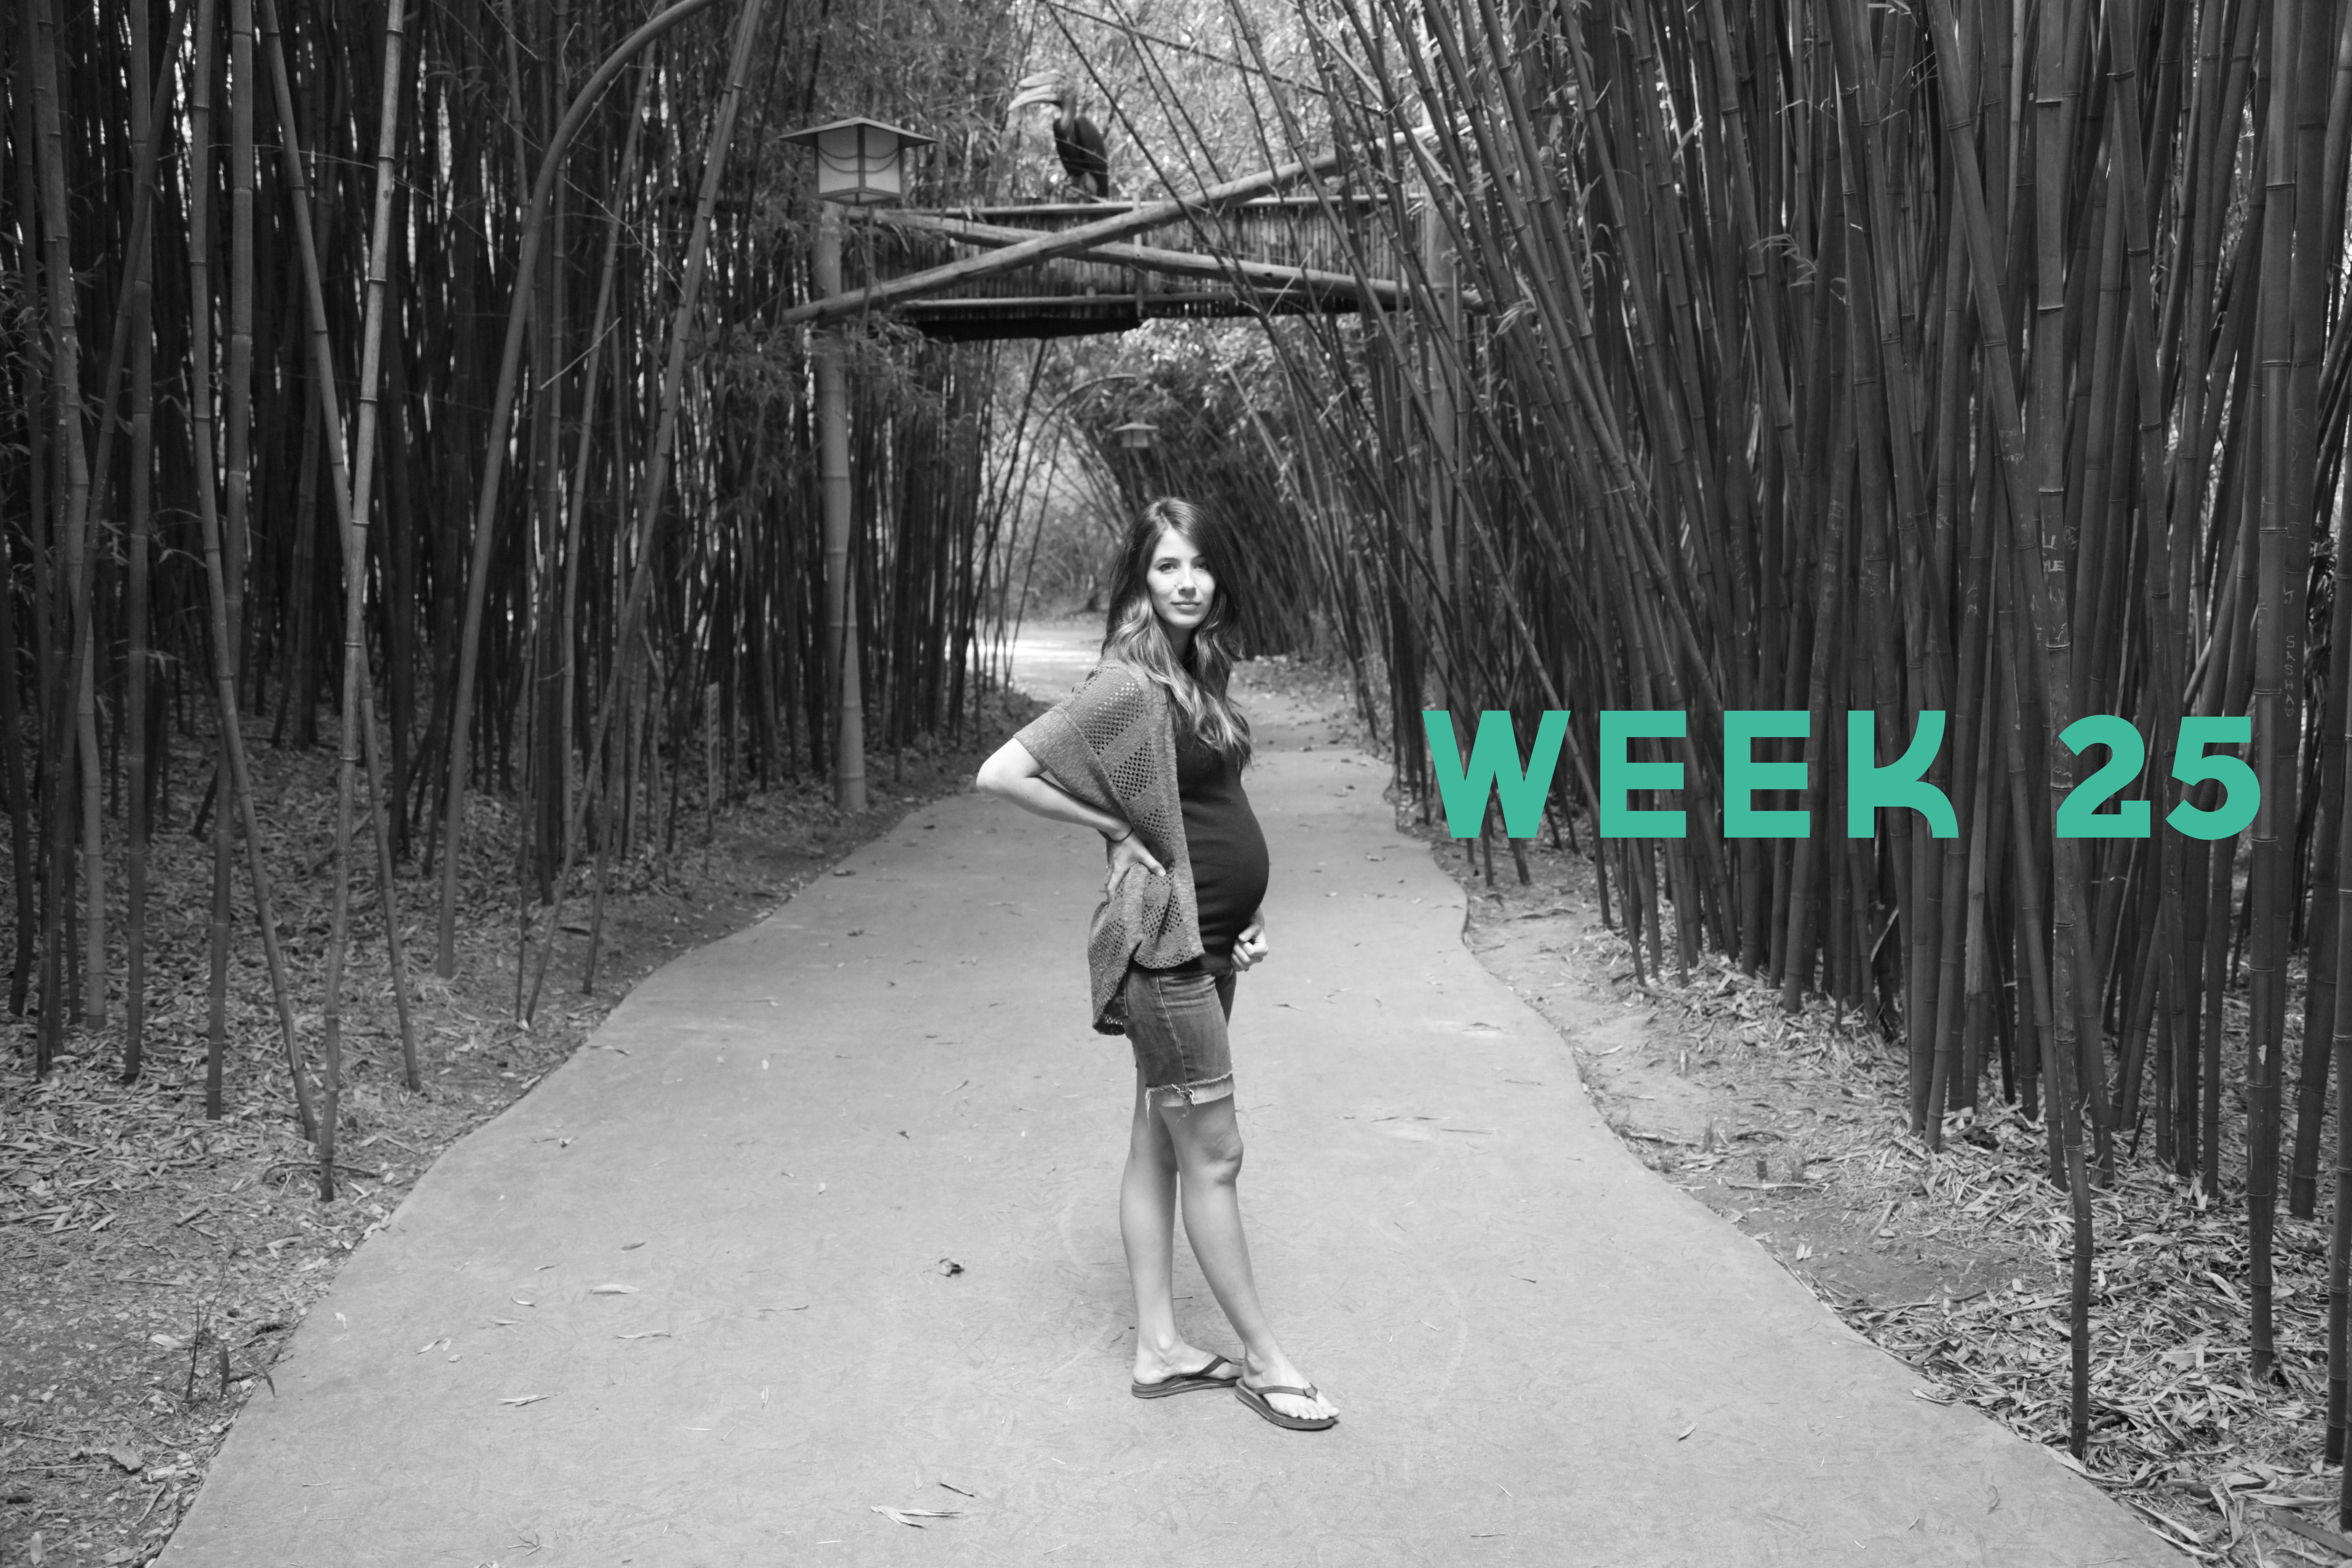 Week 25-2 final